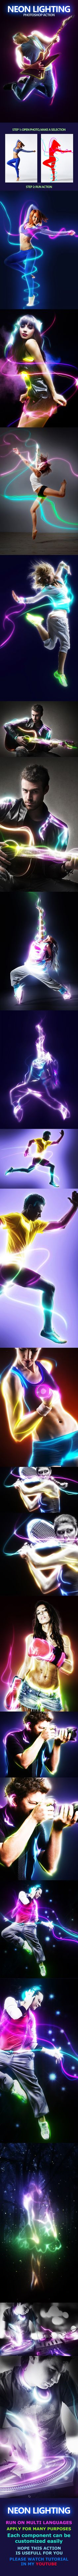 Neon Lighting - #Photo Effects #Actions Download here: https://graphicriver.net/item/neon-lighting/17893626?ref=alena994